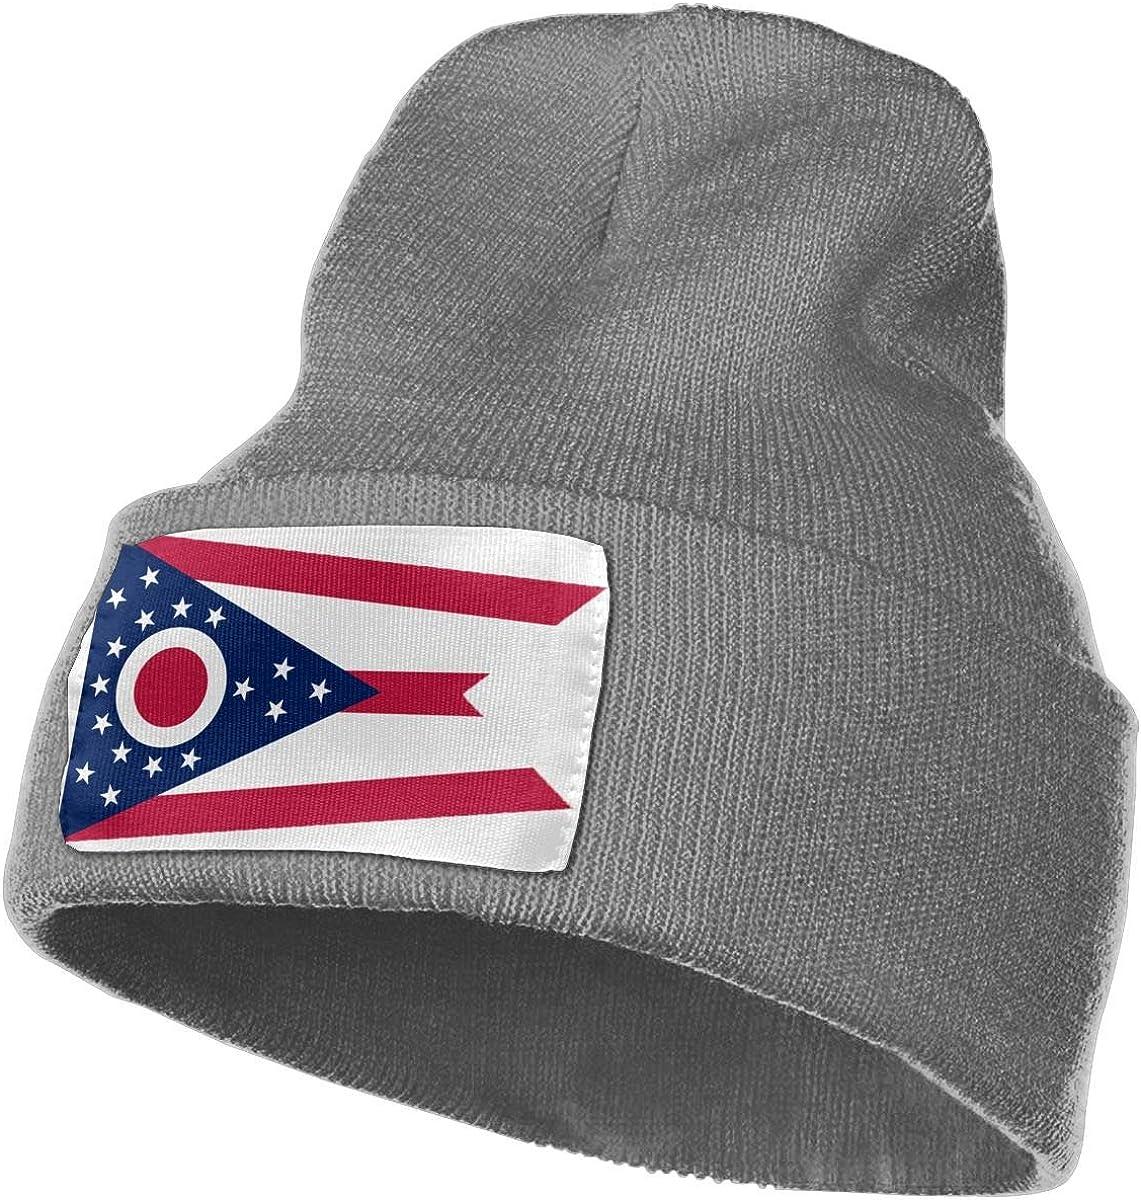 QZqDQ Ohio Flag Unisex Fashion Knitted Hat Luxury Hip-Hop Cap